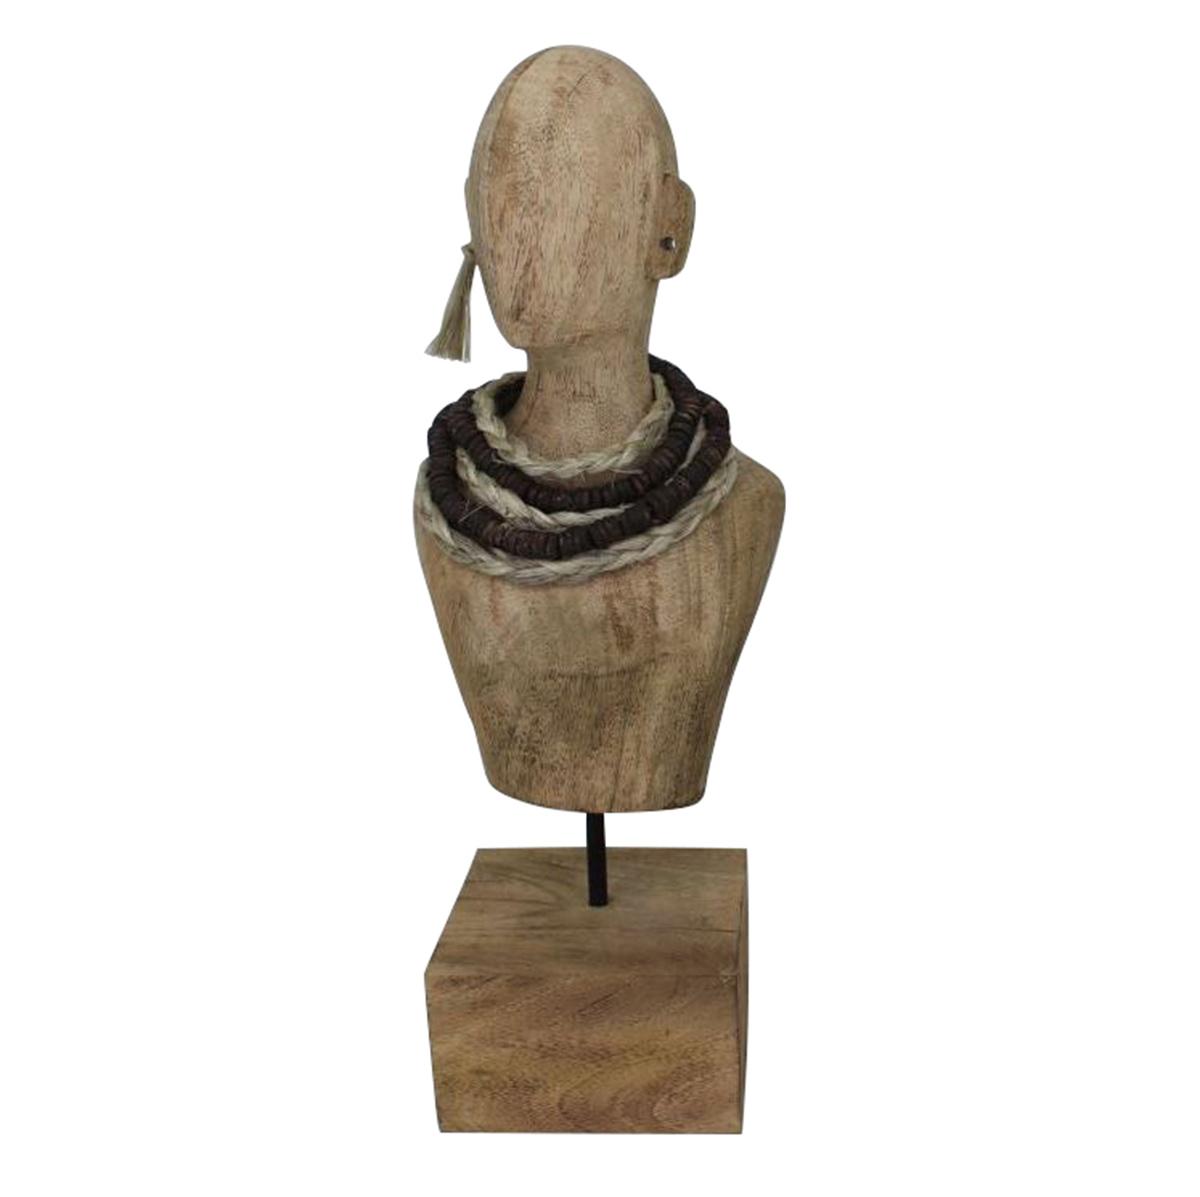 Ren-Wil Sinistra Sculpture - Natural Finish